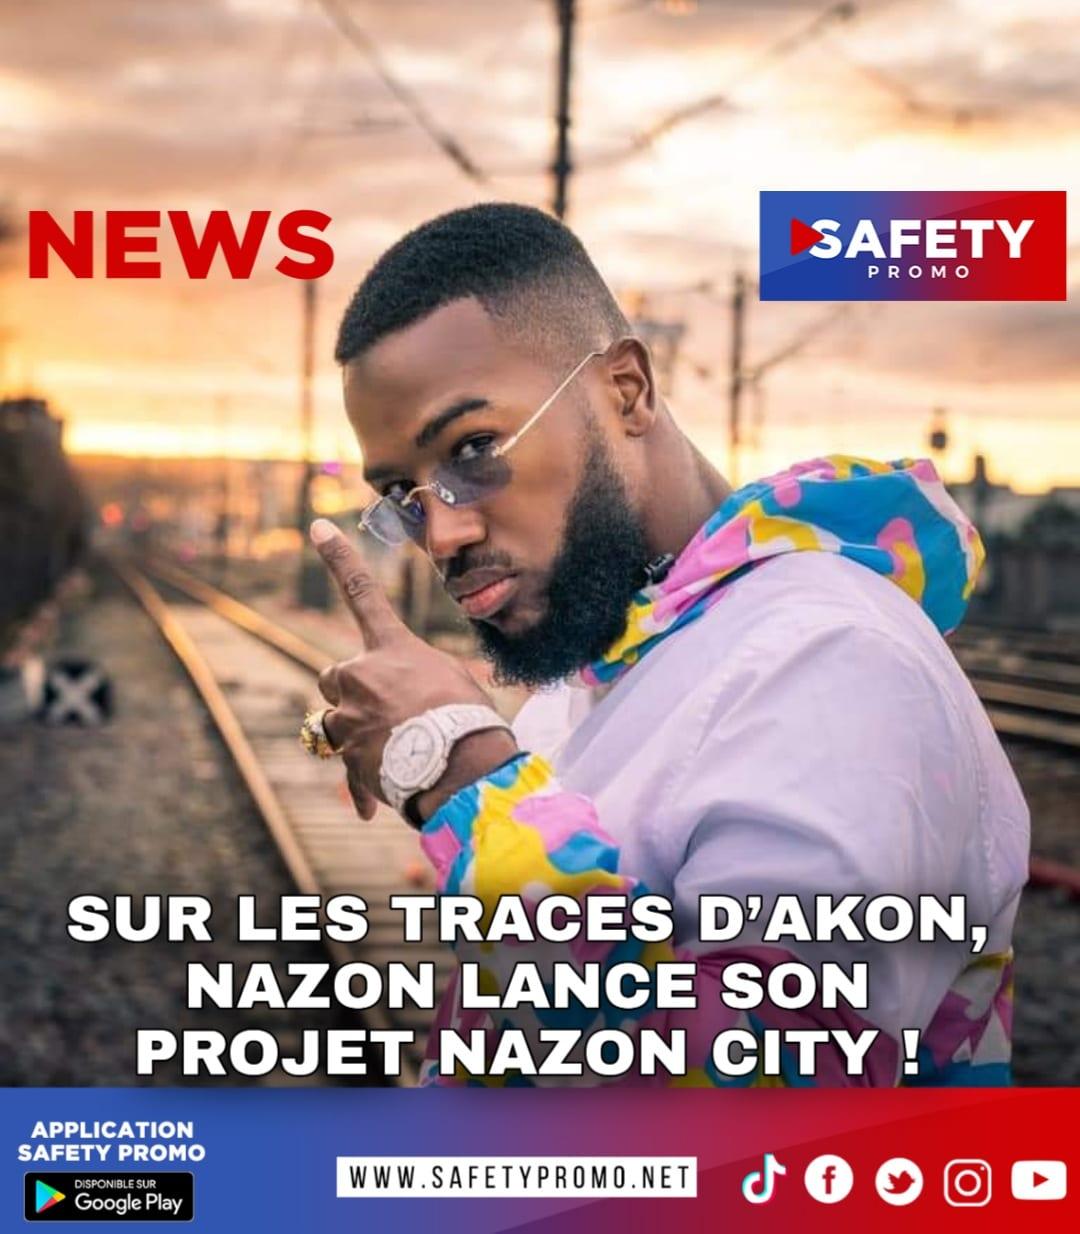 FOOTBALL : SUR LES TRACES D'AKON, NAZON LANCE SON PROJET NAZON CITY - SAFETY PROMO